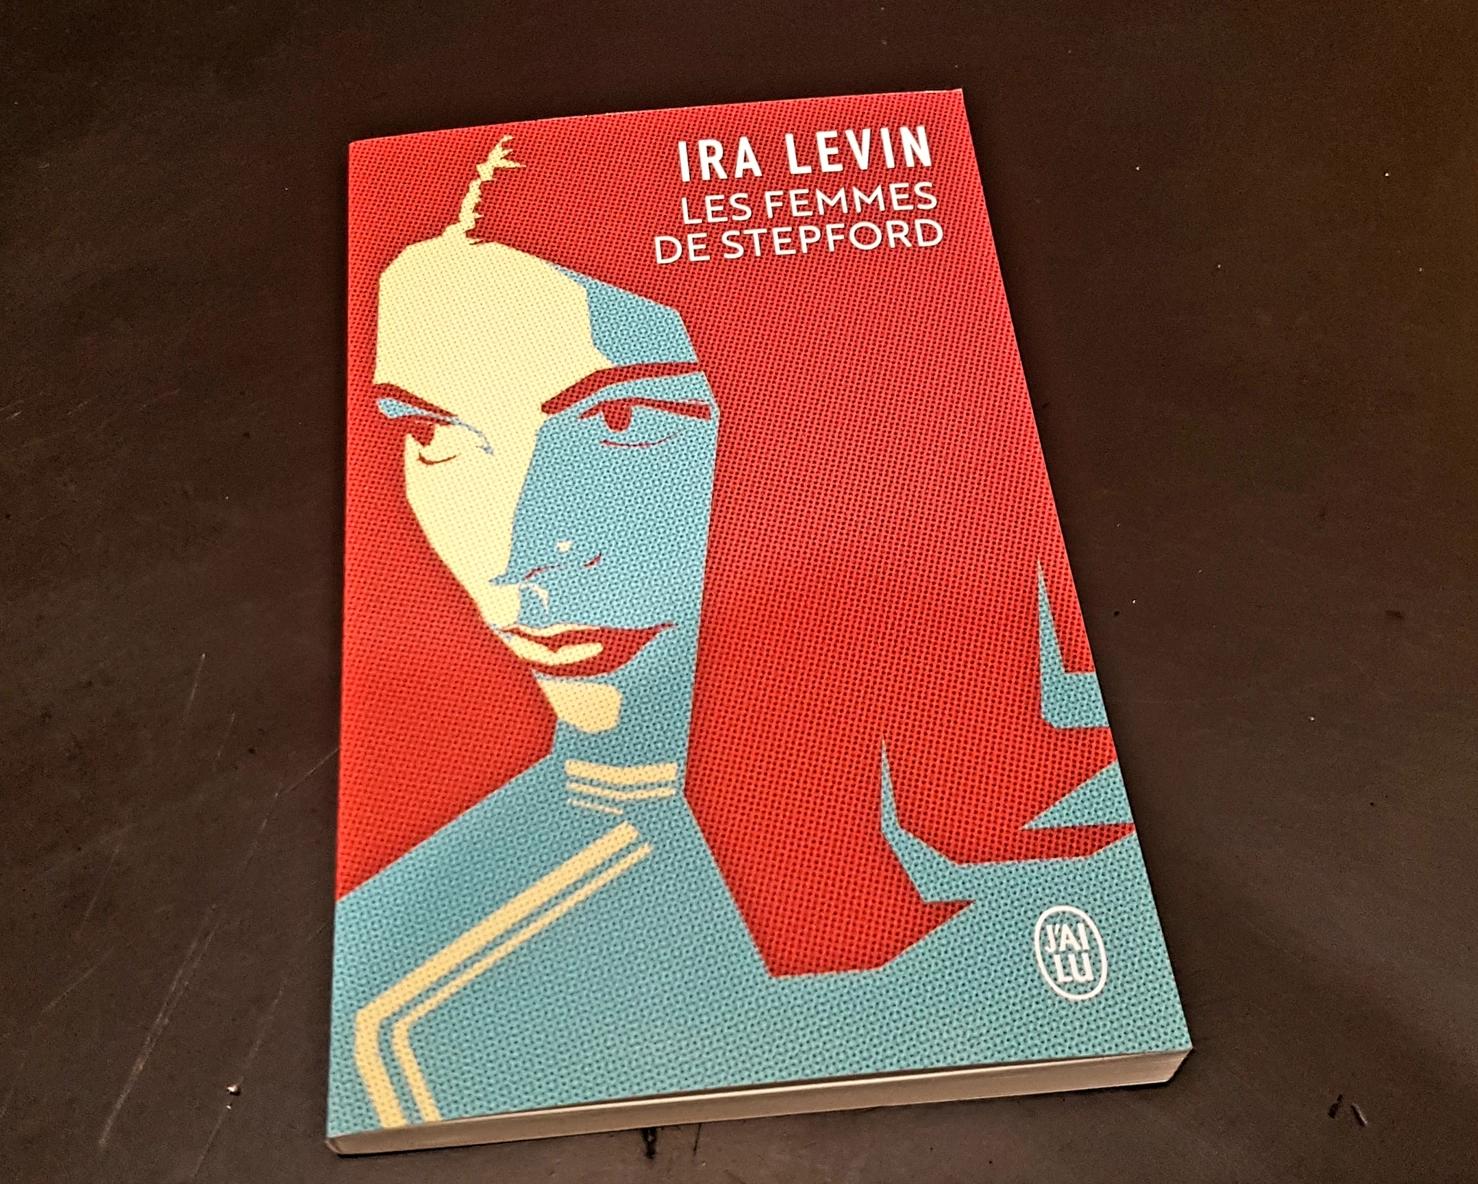 Isa Levin – Les femmes de Stepford